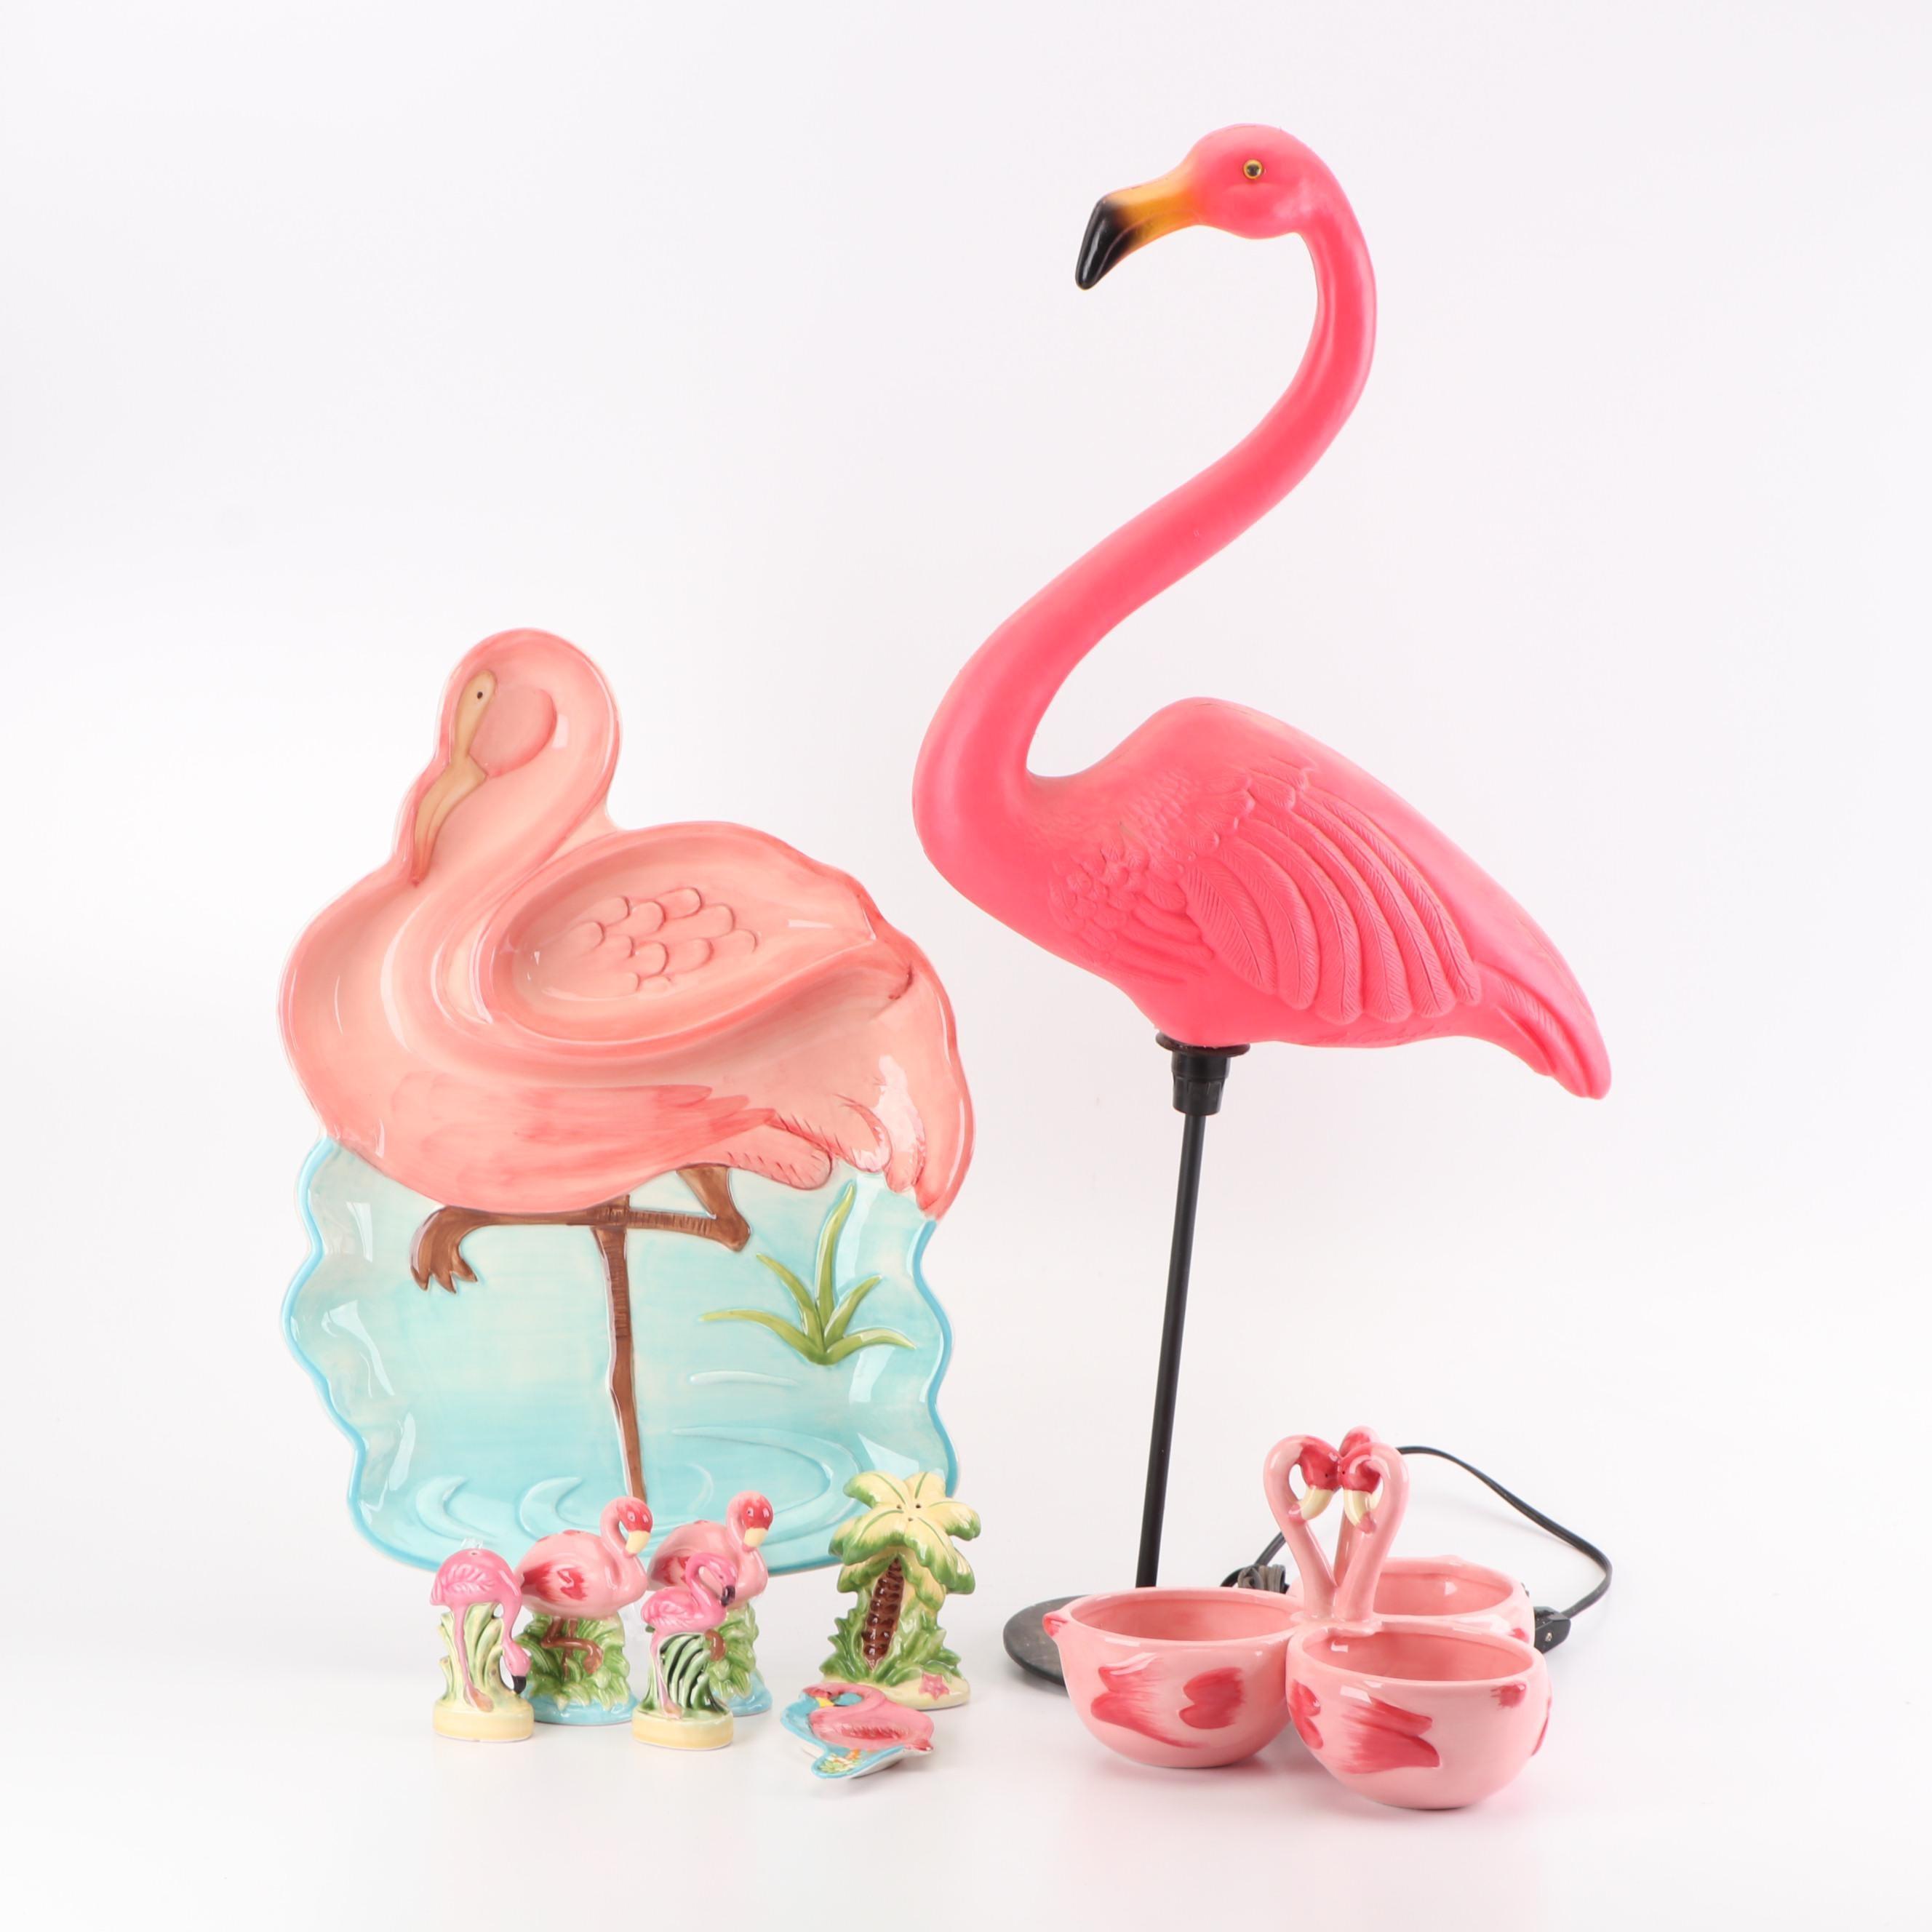 Union Products, Inc. Illuminated Lawn Flamingo with Ceramic Flamingo Tableware